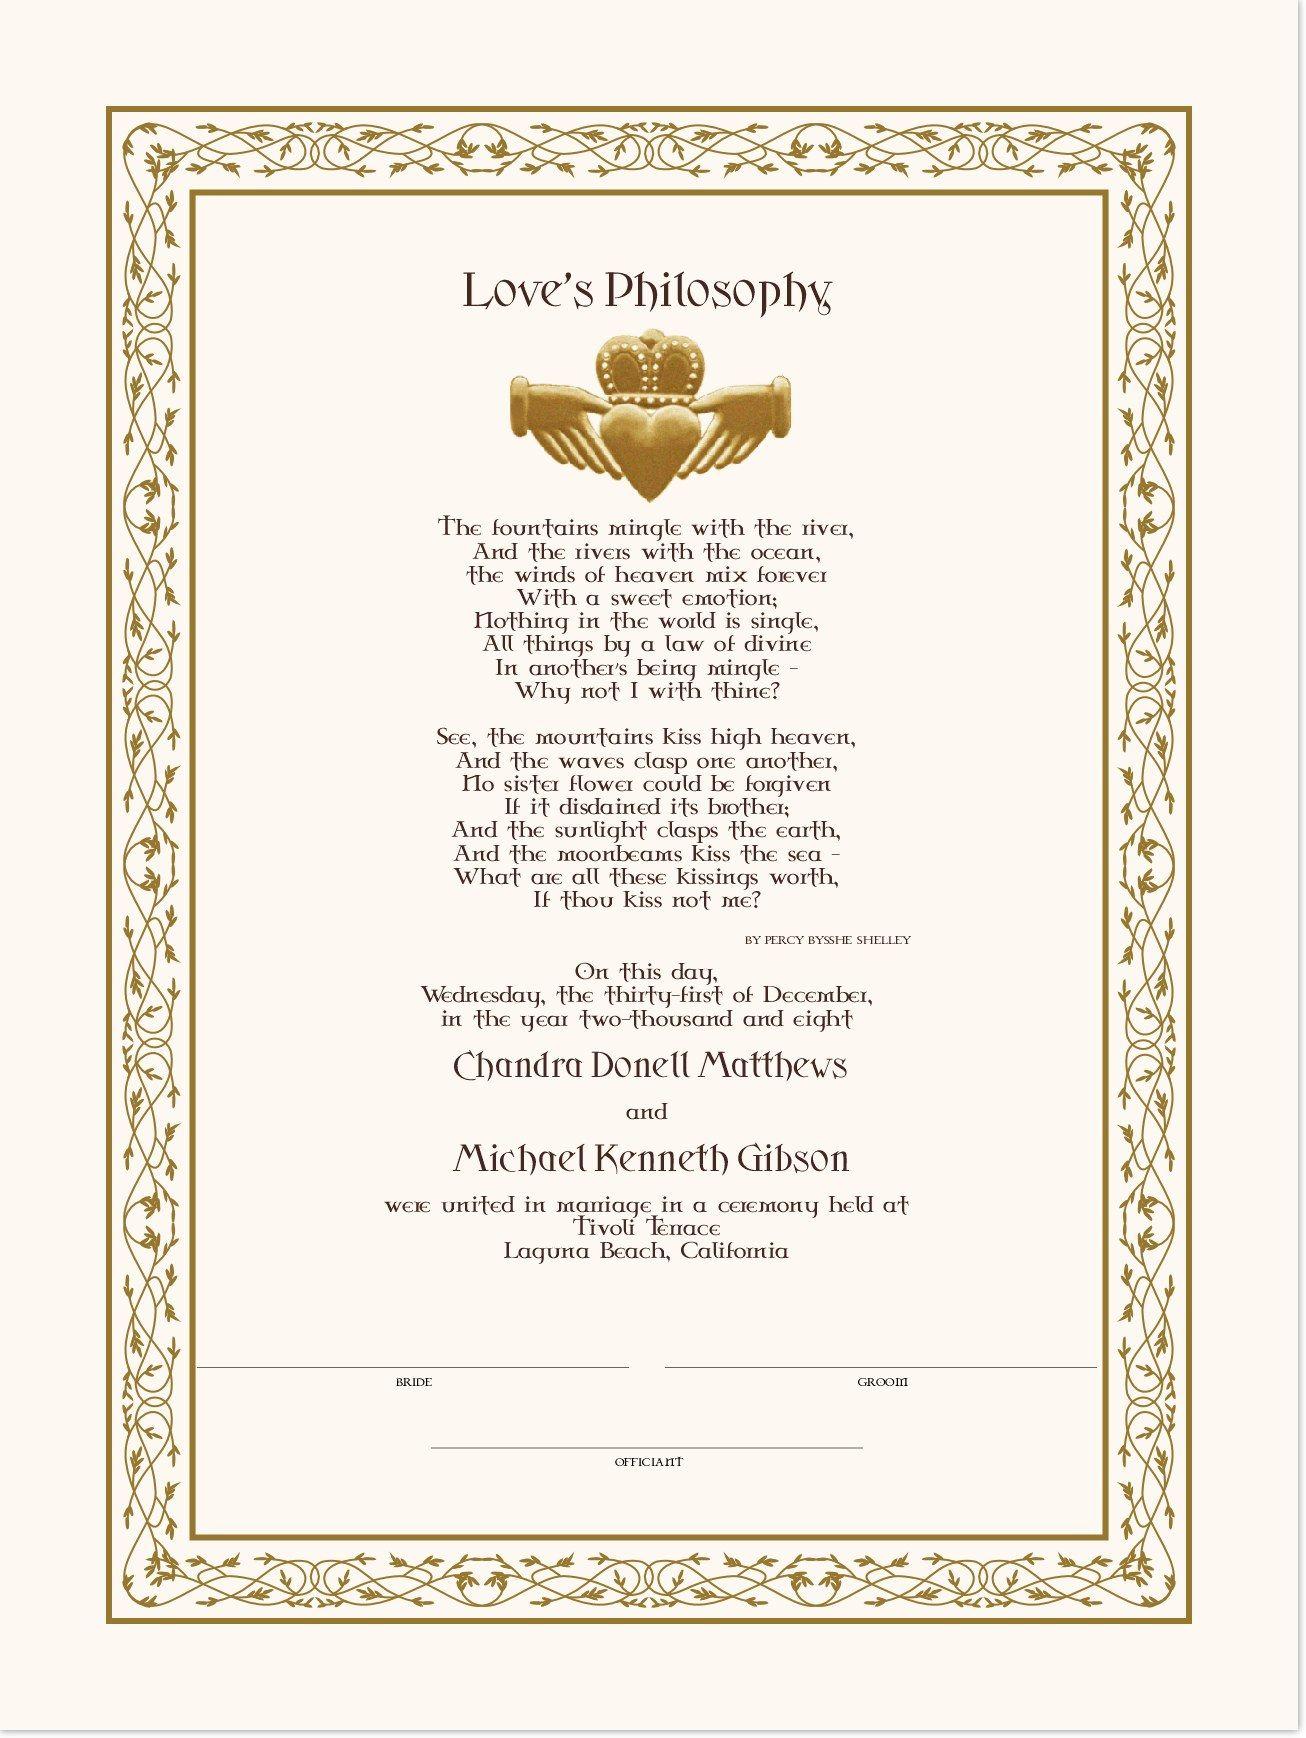 Love S Philosophy Celtic Wedding Certificates From Documents And Designs Wedding Certificate Celtic Wedding Wedding